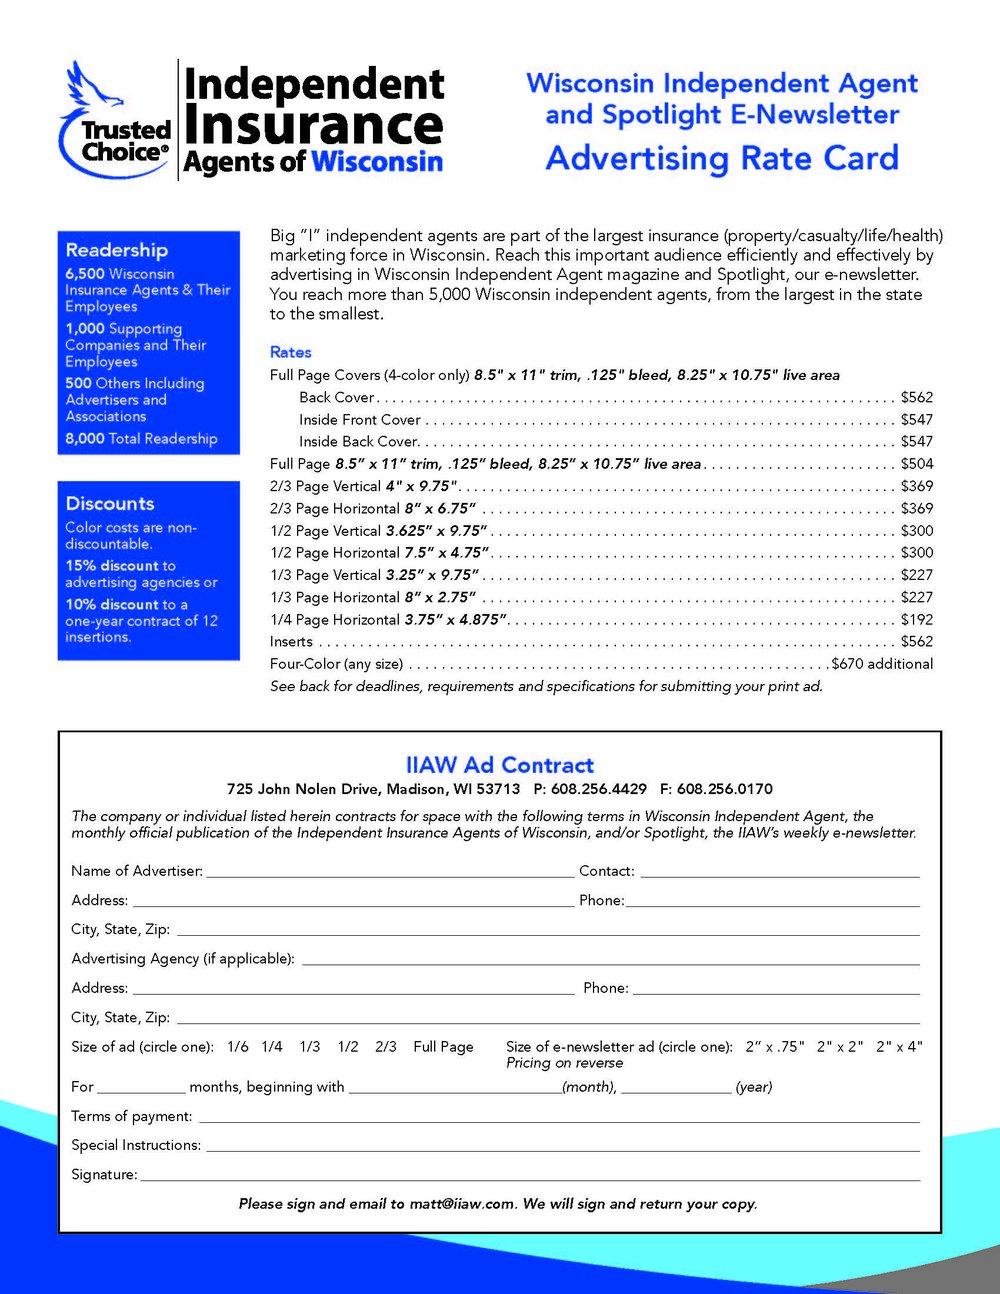 2017 IIAW Rate Card_Page_1.jpg